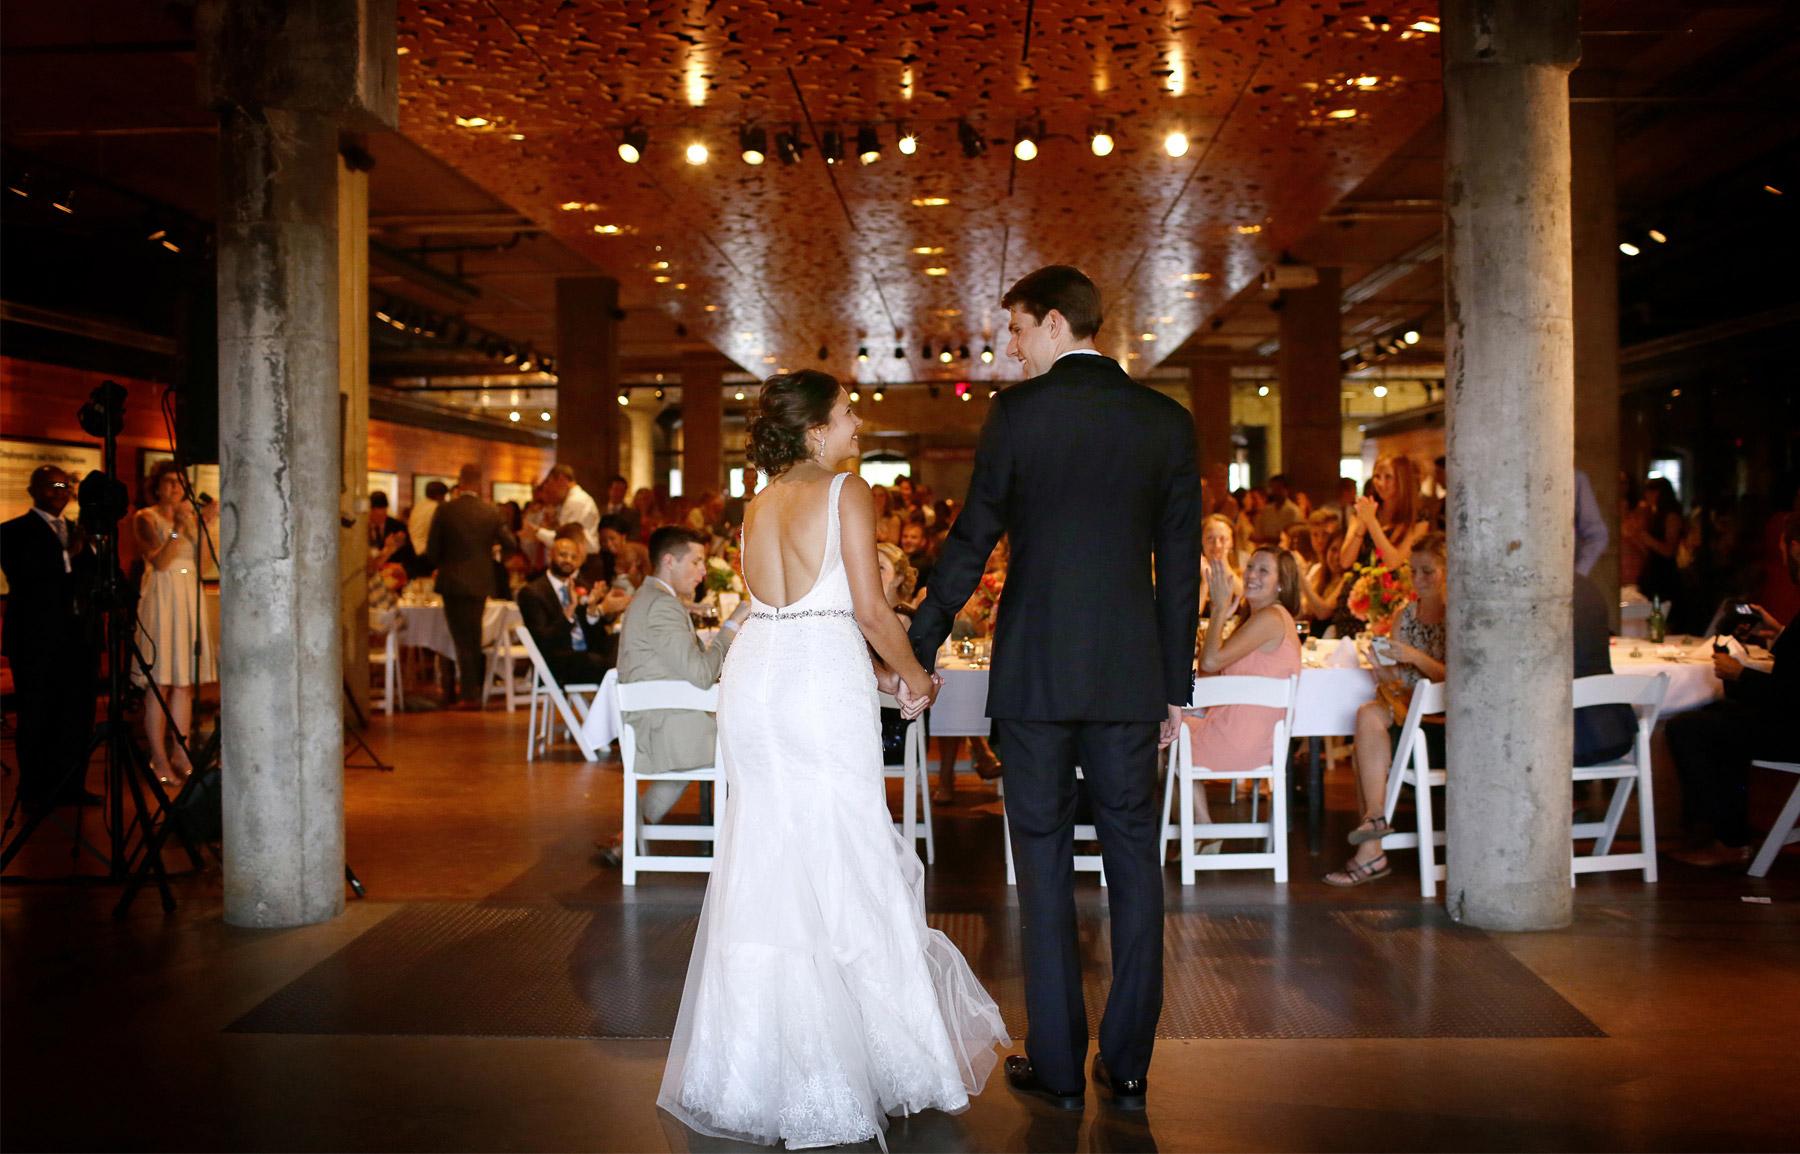 19-Minneapolis-Minnesota-Wedding-Photography-by-Vick-Photography-Downtown-Mill-City-Museum-Reception-Lalu-&-John.jpg